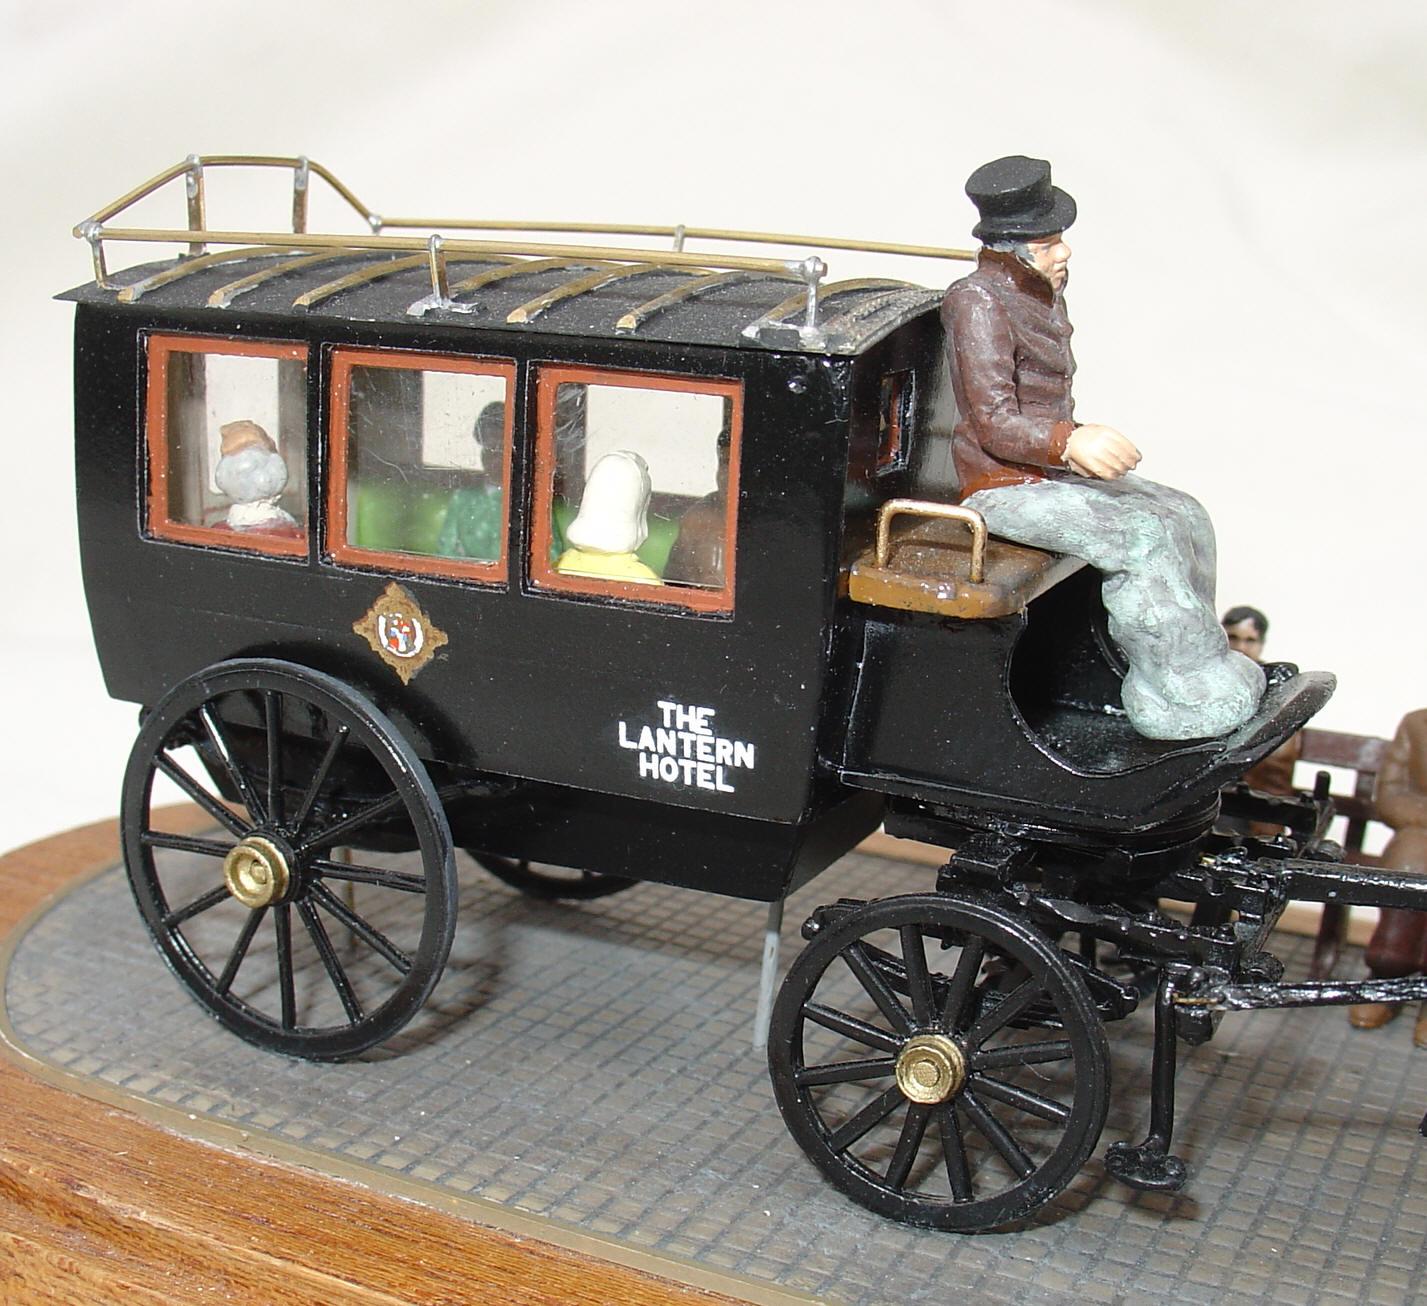 Drawn trolley model horse Drawn Station/Hotel Bus Models Horse